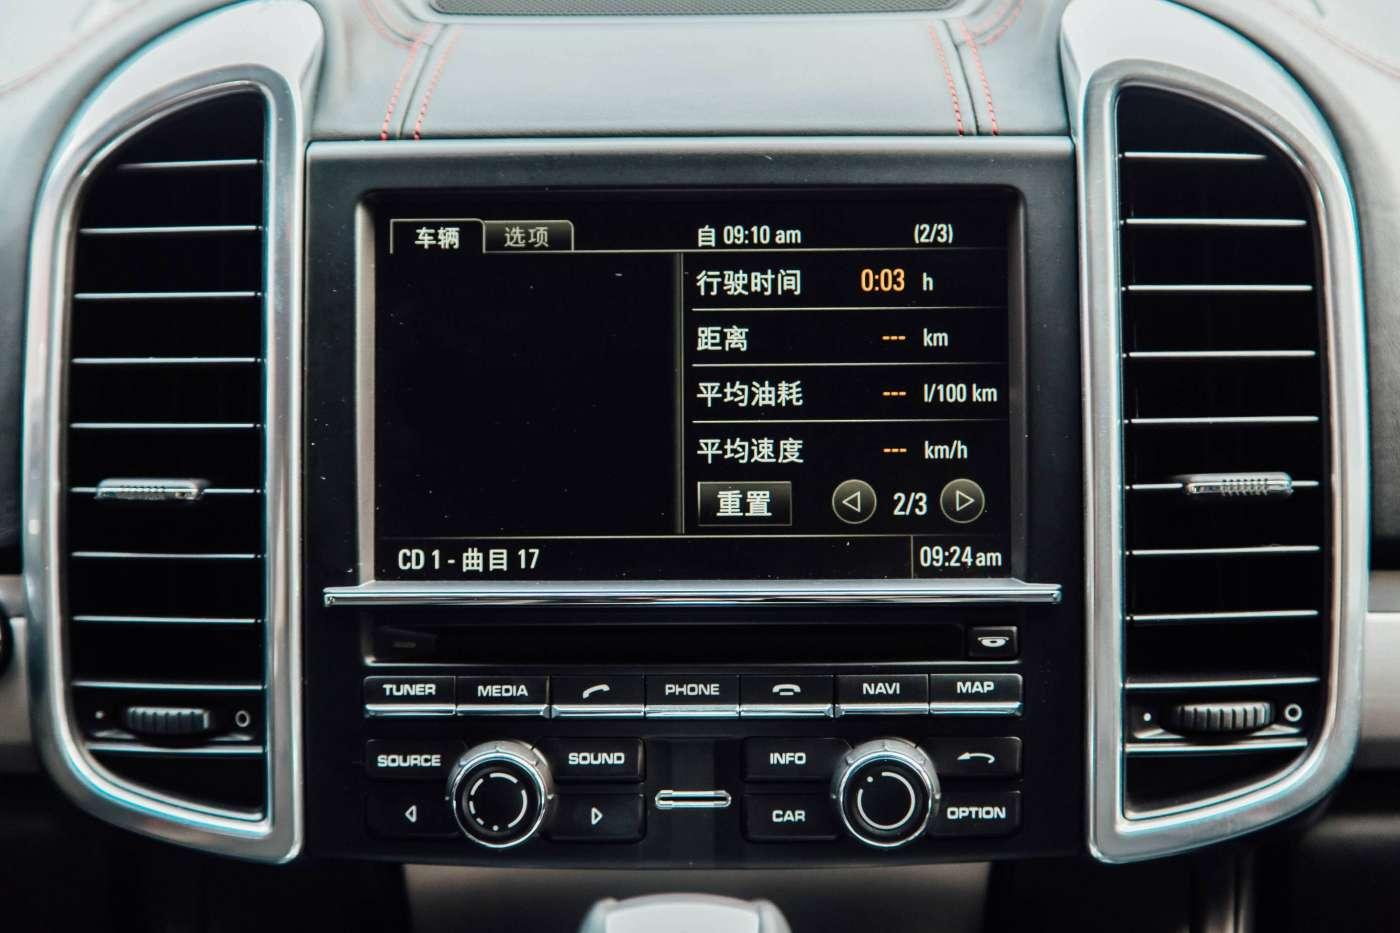 Cayenne 2012款 Cayenne GTS 4.8L|甄选保时捷-北京卡斯基汽车服务有限公司